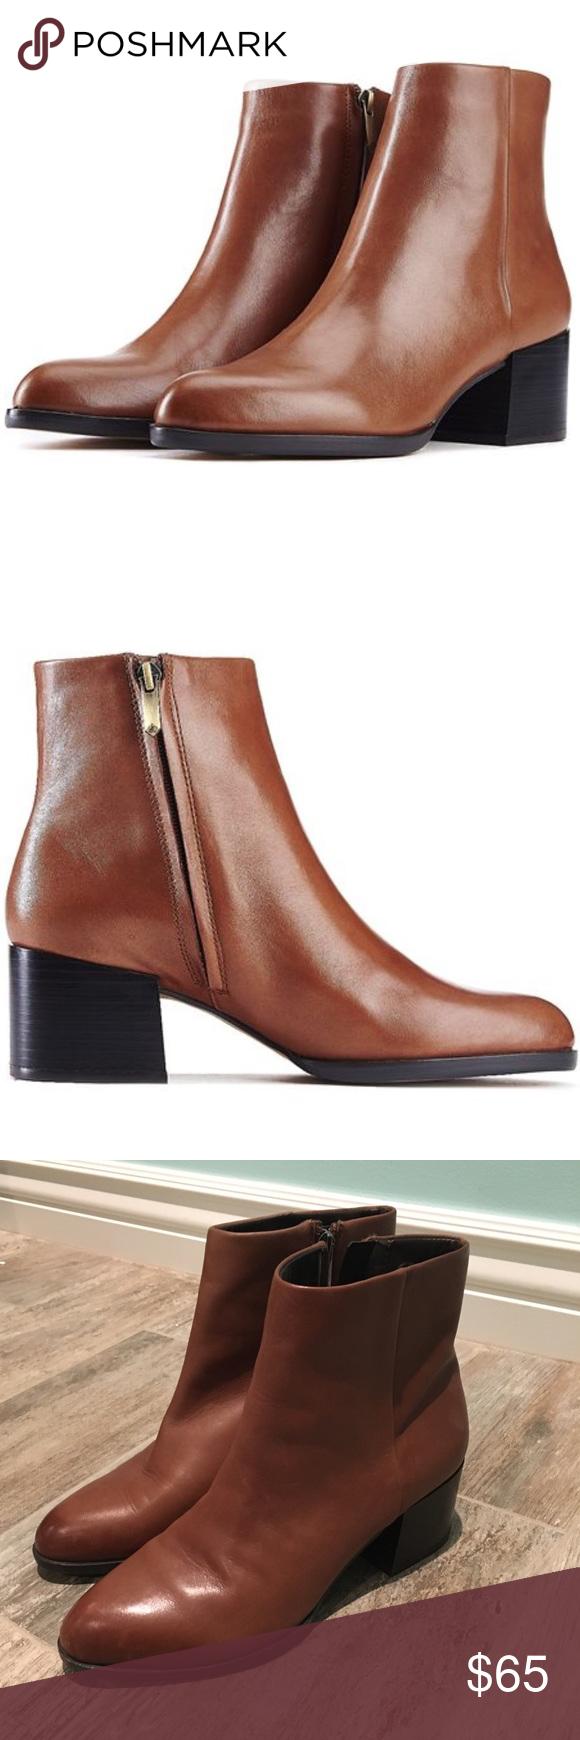 e13bea3dbb6ec Sam Edelman Joey saddle heel boots